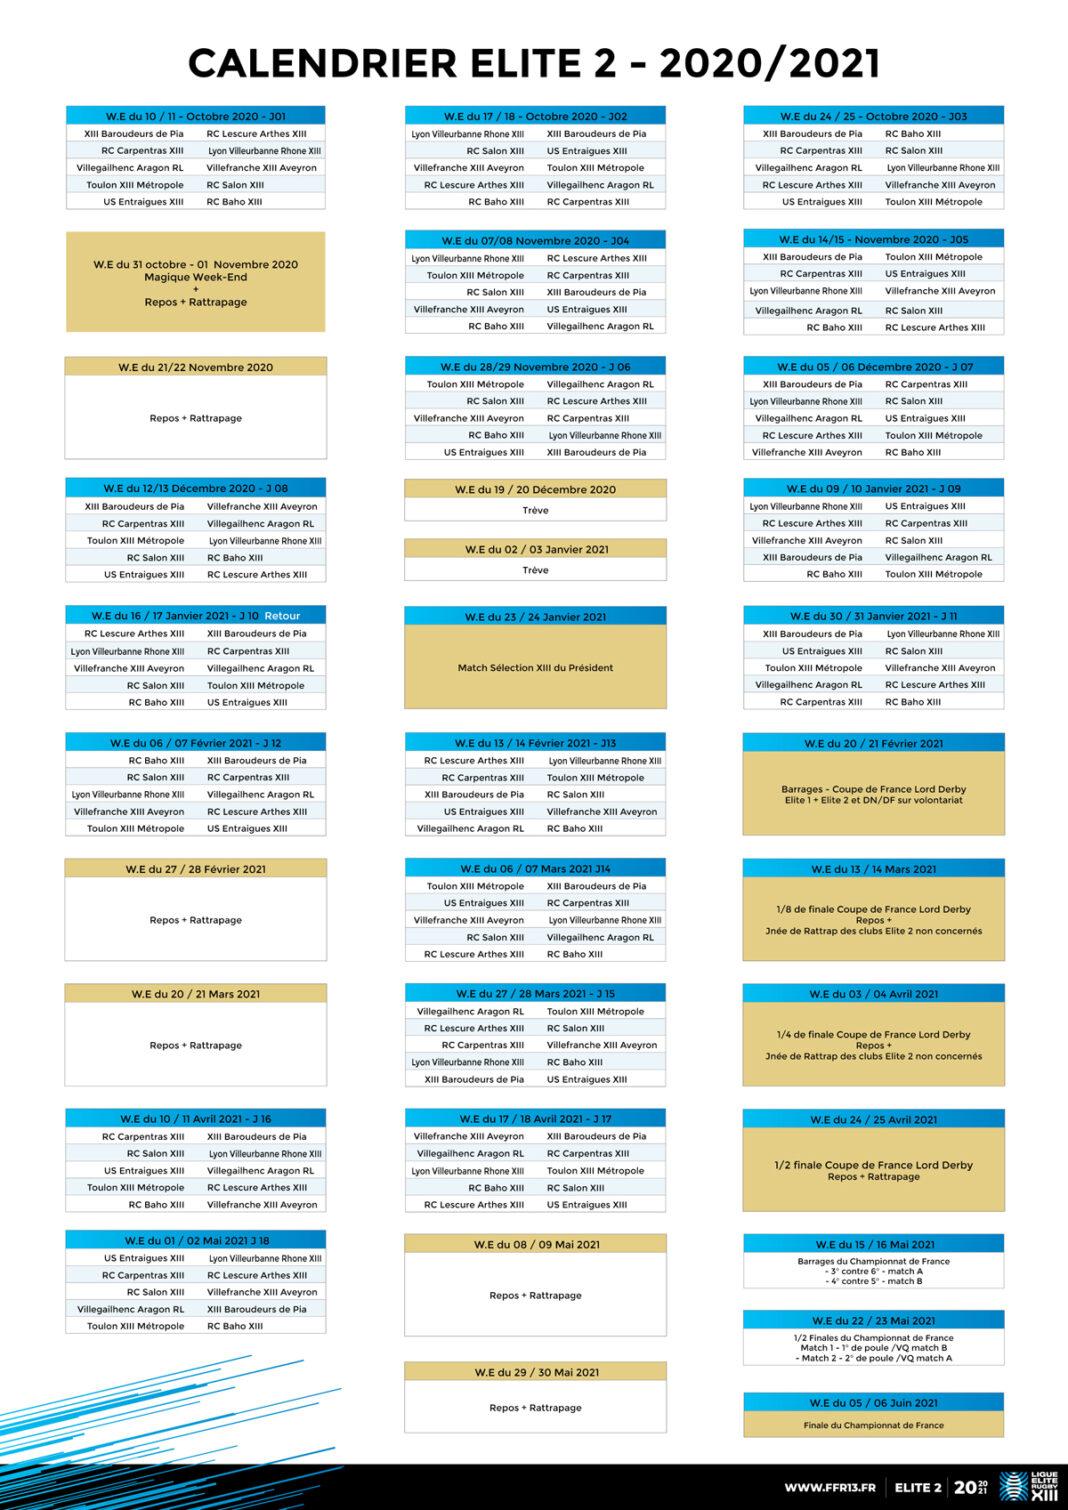 calendrier-elite2-2020-2021